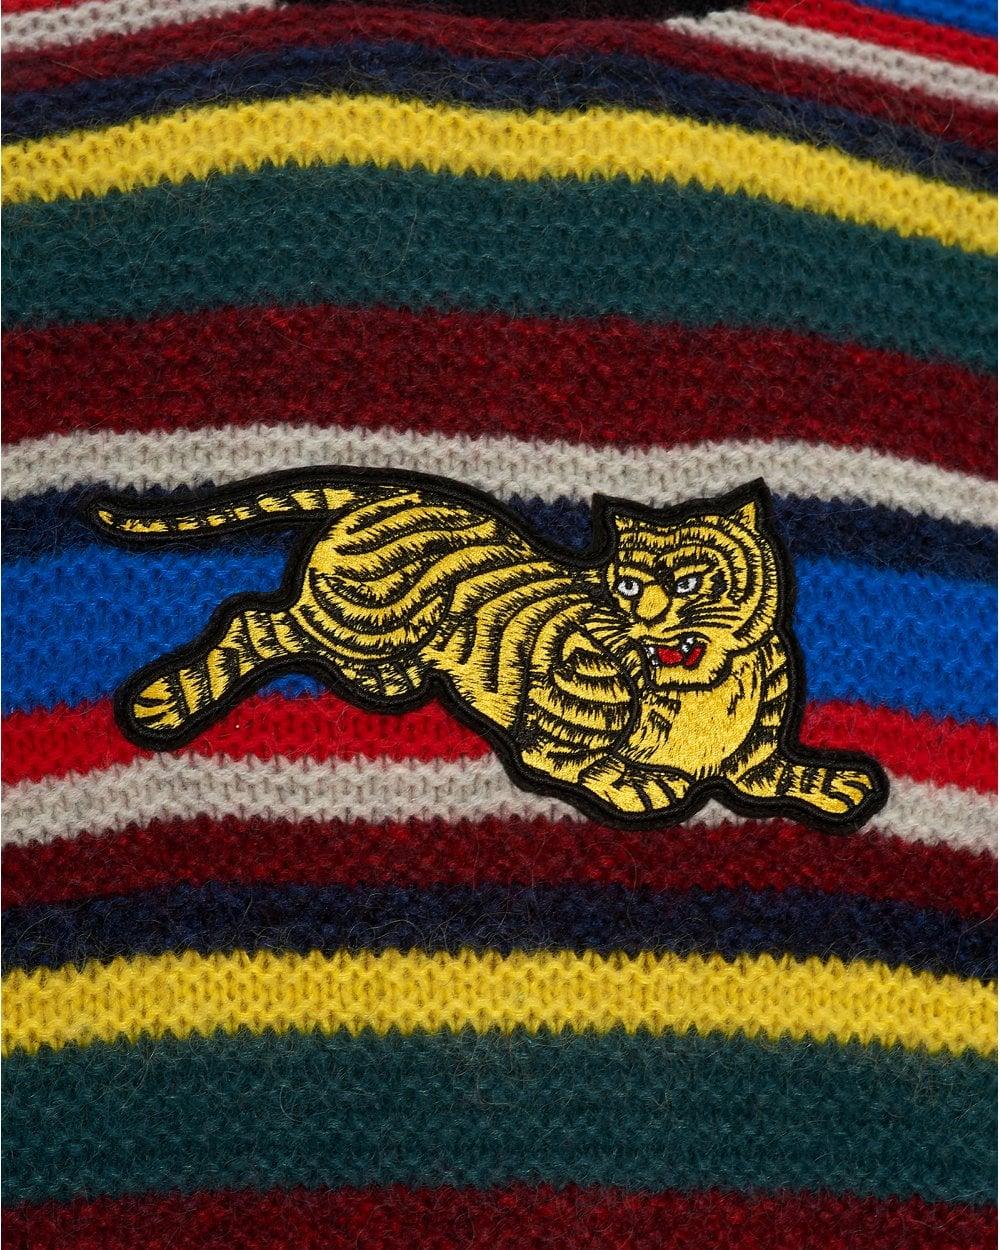 233f8285 Kenzo Mens Jumping Tiger Striped Jumper, Multi Coloured Sweater